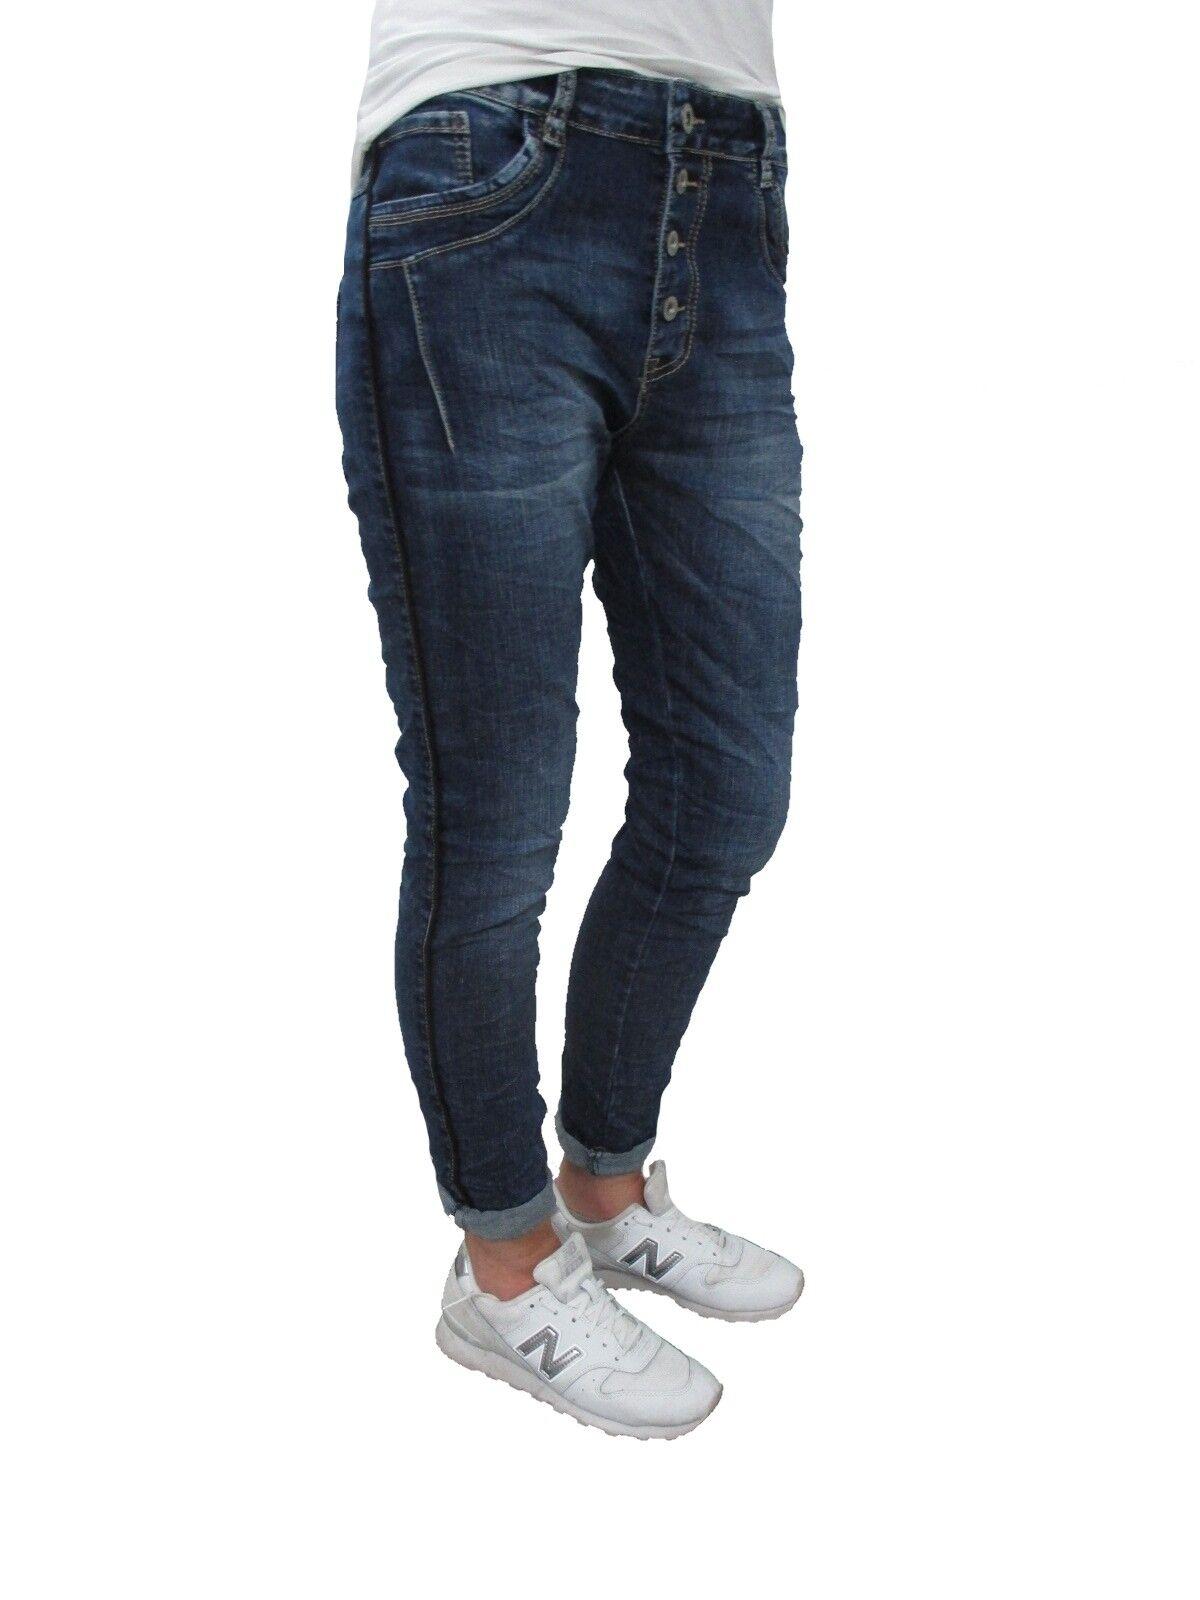 Karostar Lexxury Stretch Baggy Boyfriend Jeans blacke Seitenstreifen